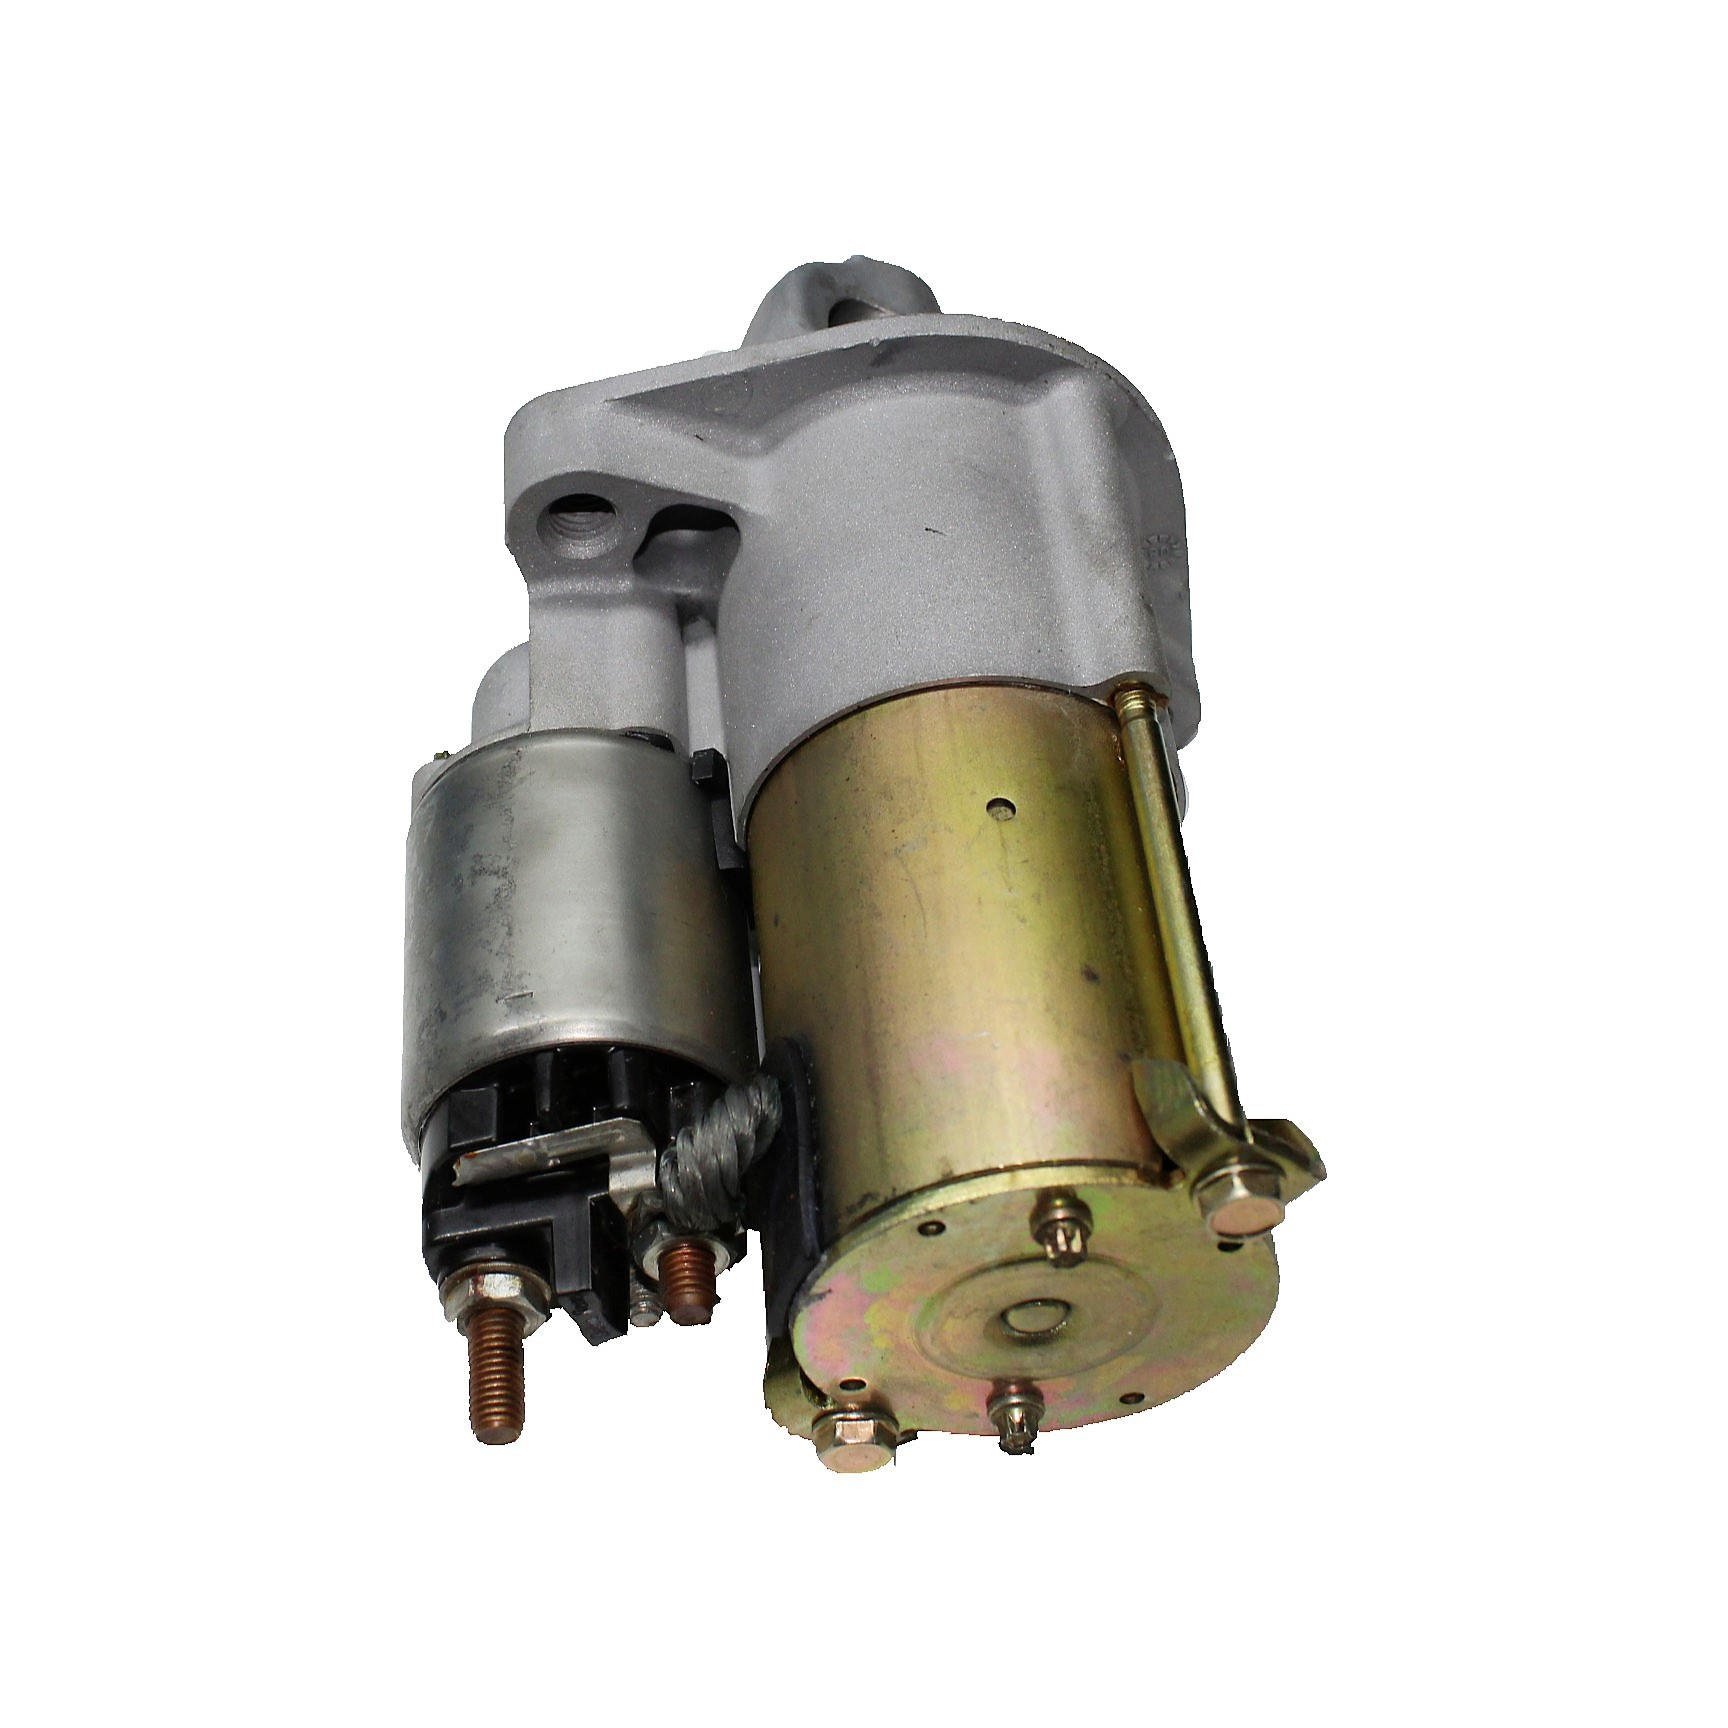 Motor de Arranque Partida Bosch Astra, Zafira, Vectra - Motor 8v